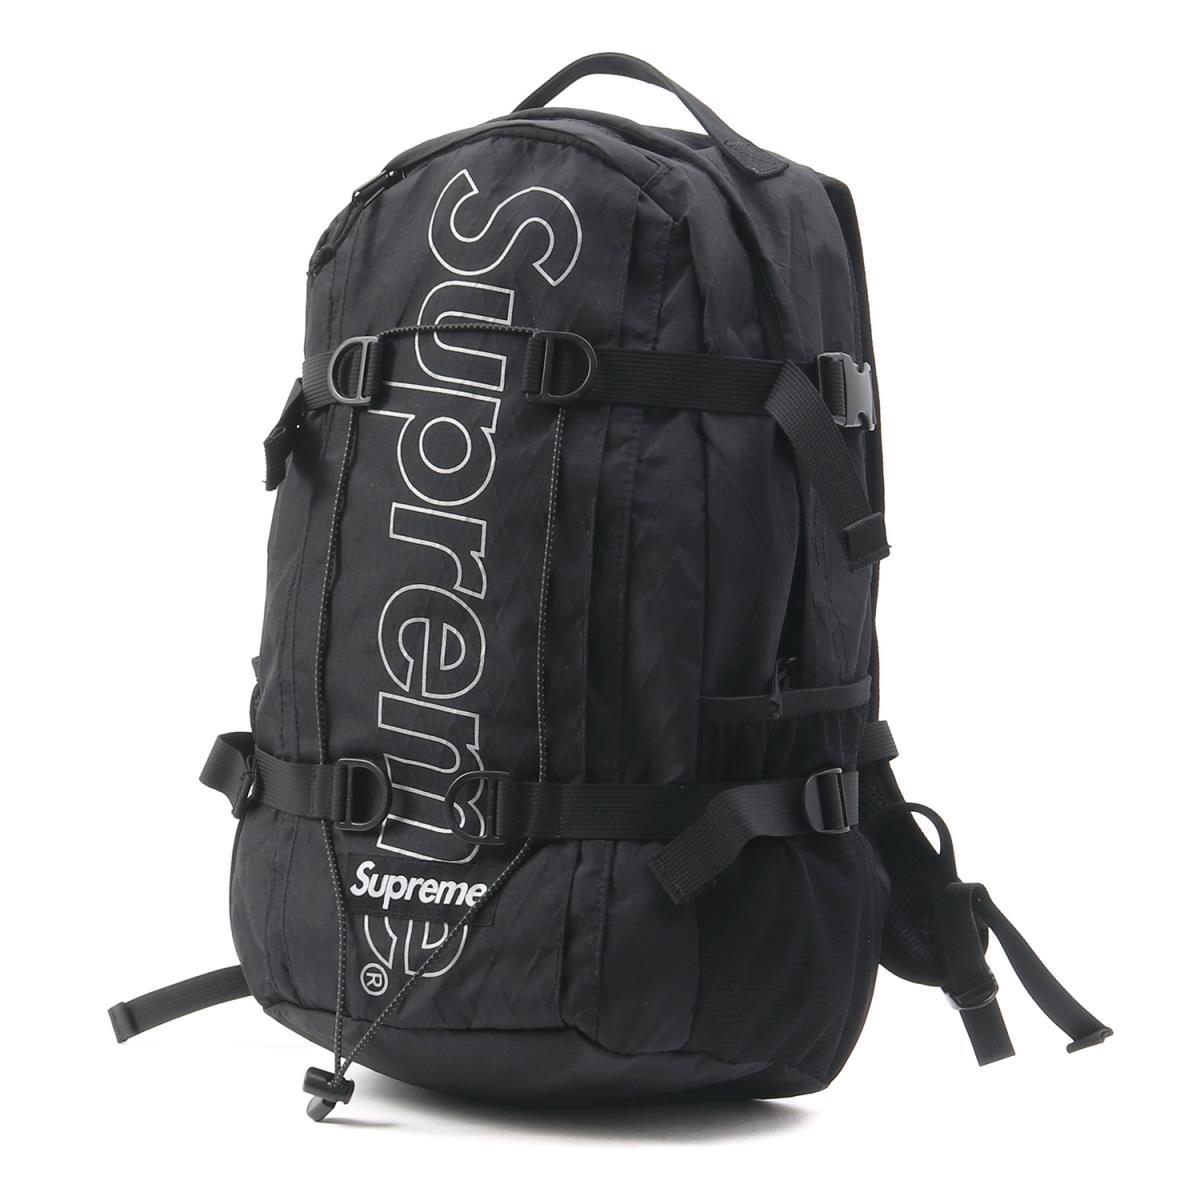 Supreme (シュプリーム) 18A/W ブランドロゴX-PACバックパック(Backpack) ブラック 【美品】【メンズ】【K2191】【中古】【あす楽☆対応可】